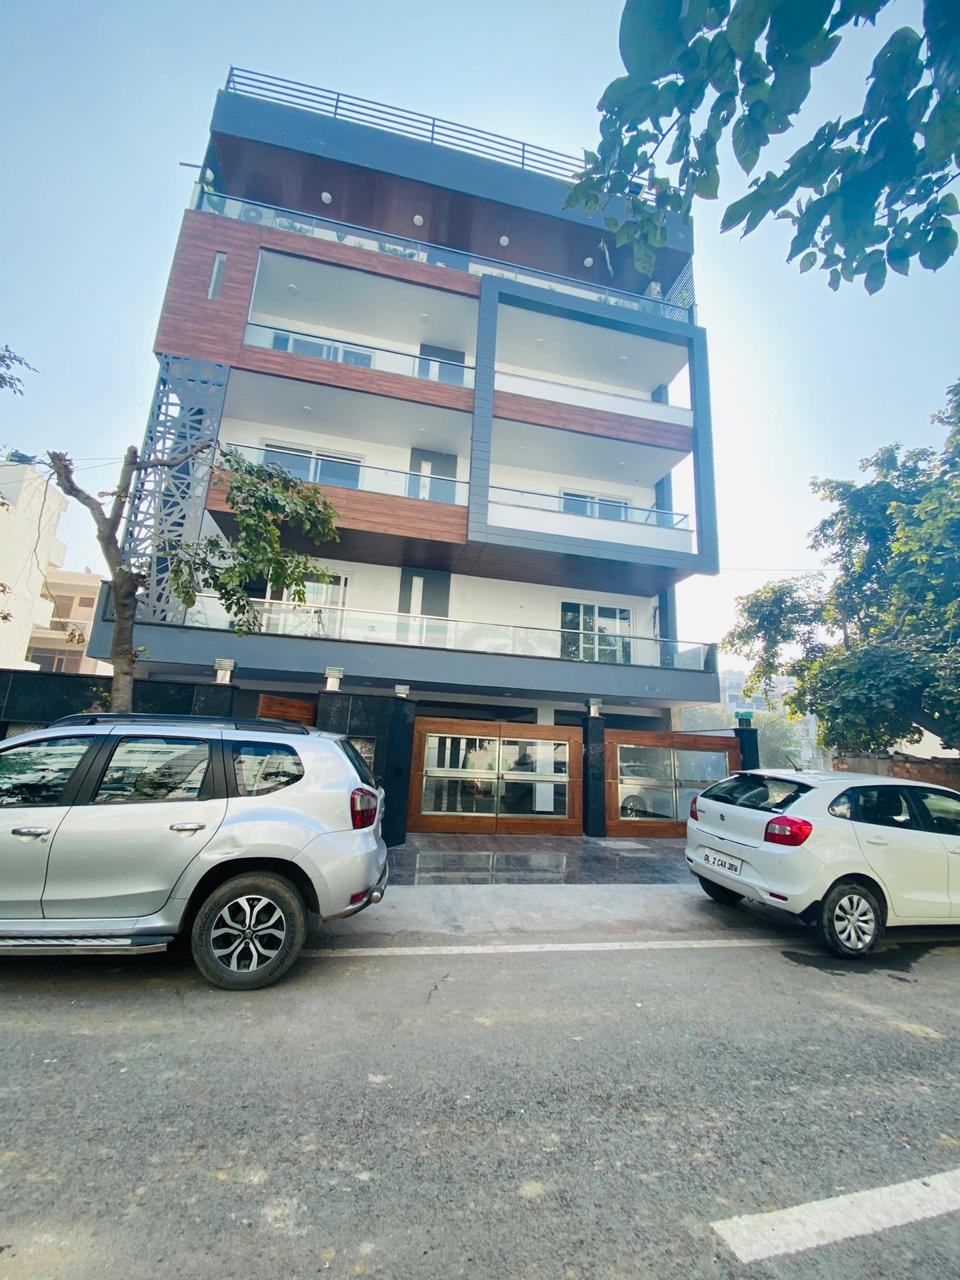 4 BHK Builder Floor in South City 1, Gurgaon